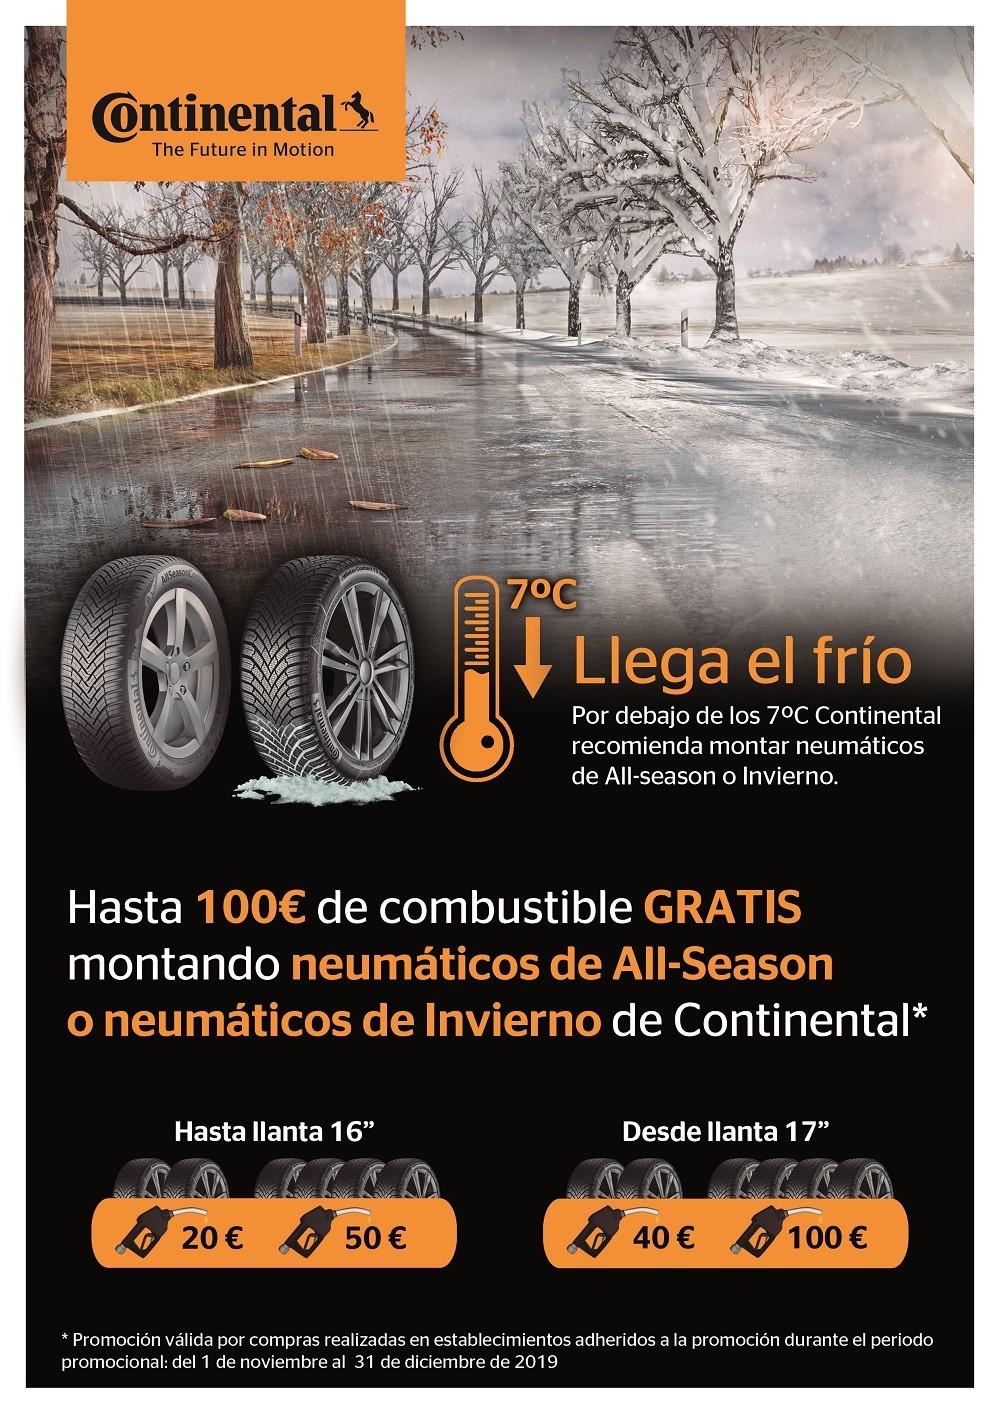 Gana hasta 100€ en combustible por montar neumáticos Continental